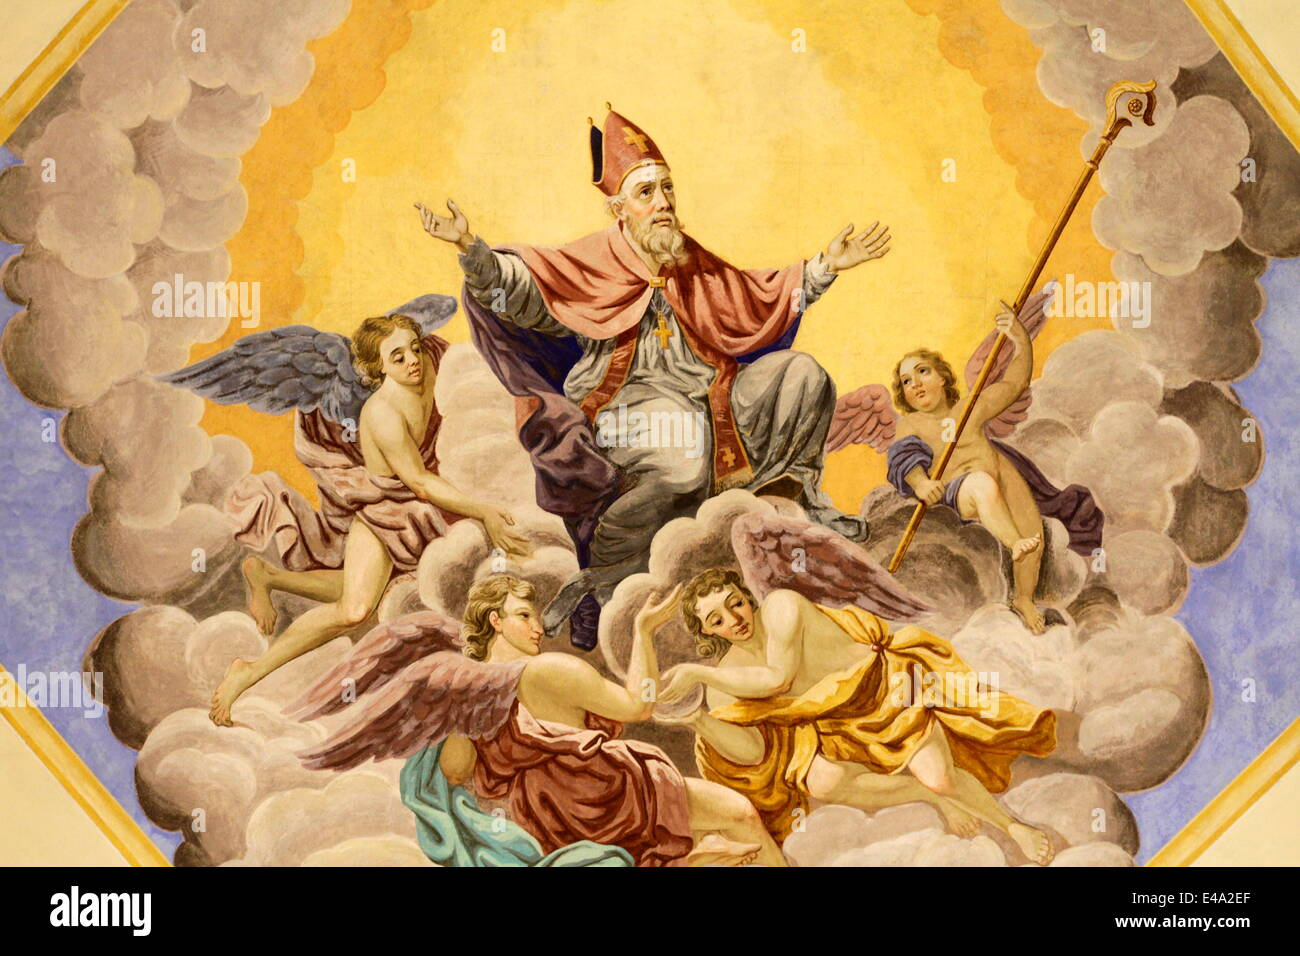 St. Nicolas ascends to heaven, Bishop of Myra, Life of St. Nicolas, St. Nicolas de Veroce church, St. Nicolas de - Stock Image